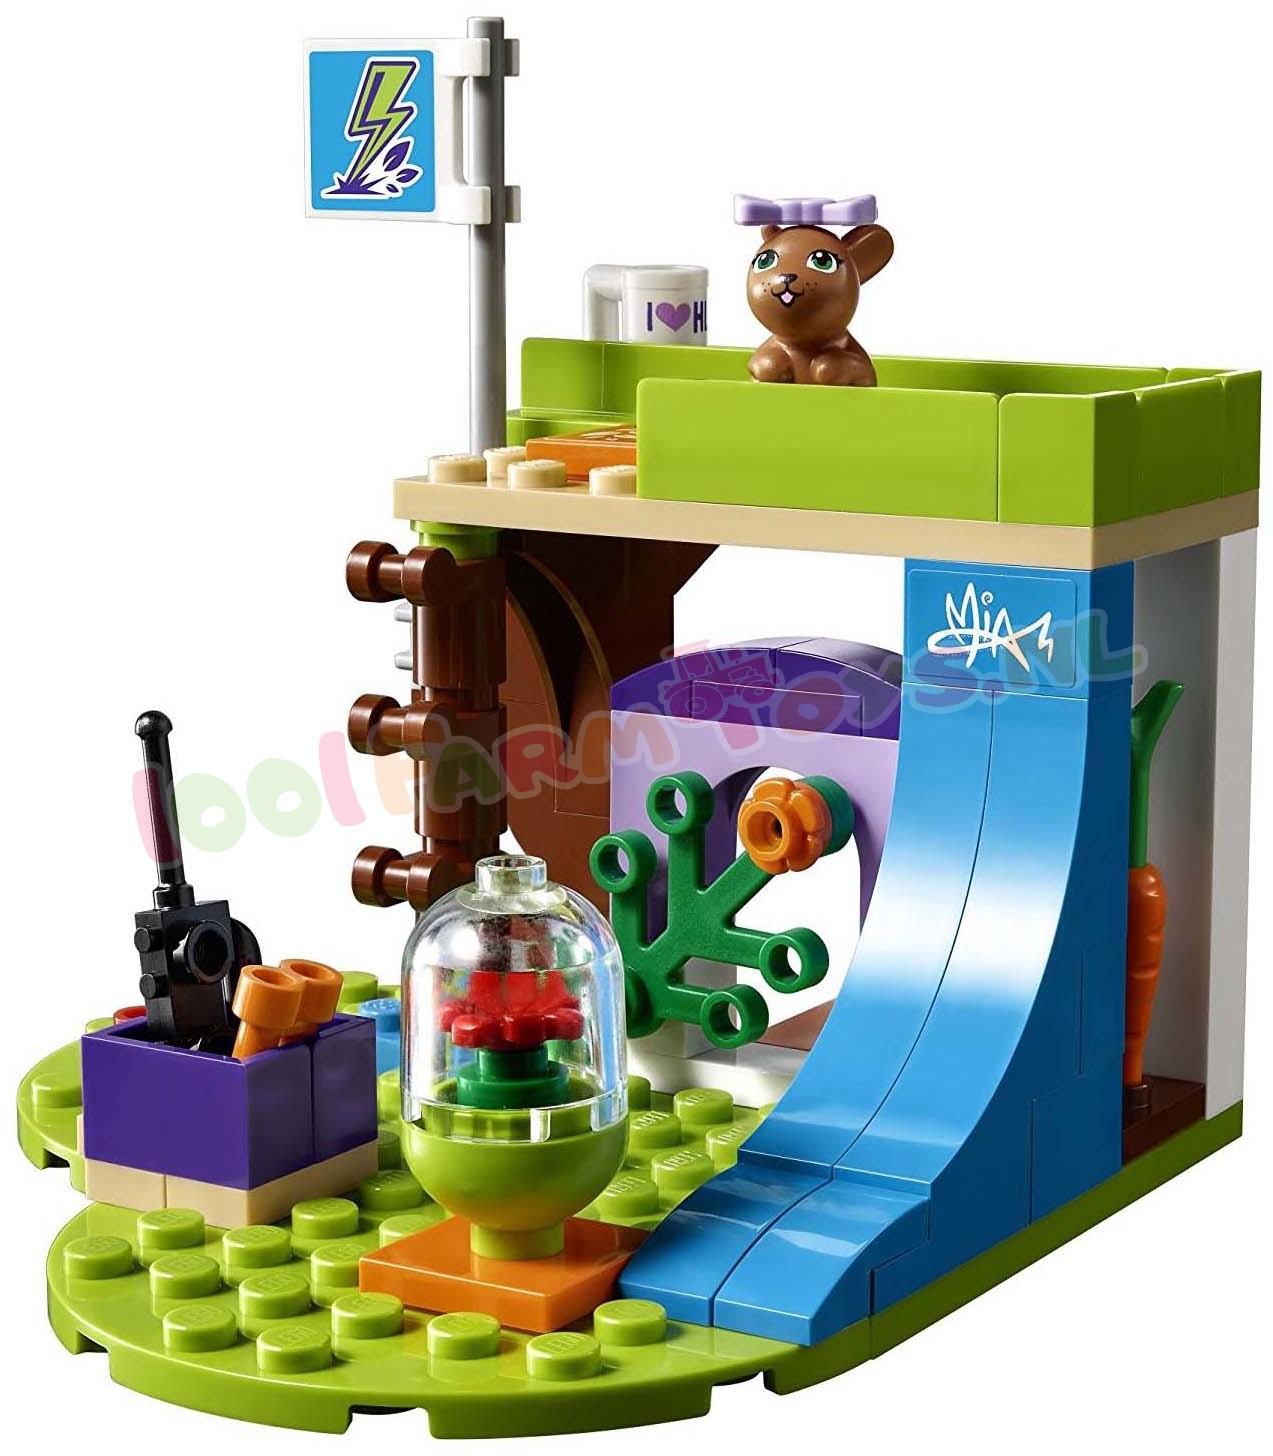 LEGO FRIENDS MIAS SLAAPKAMER - 41327 - LEGO Friends - LEGO ...